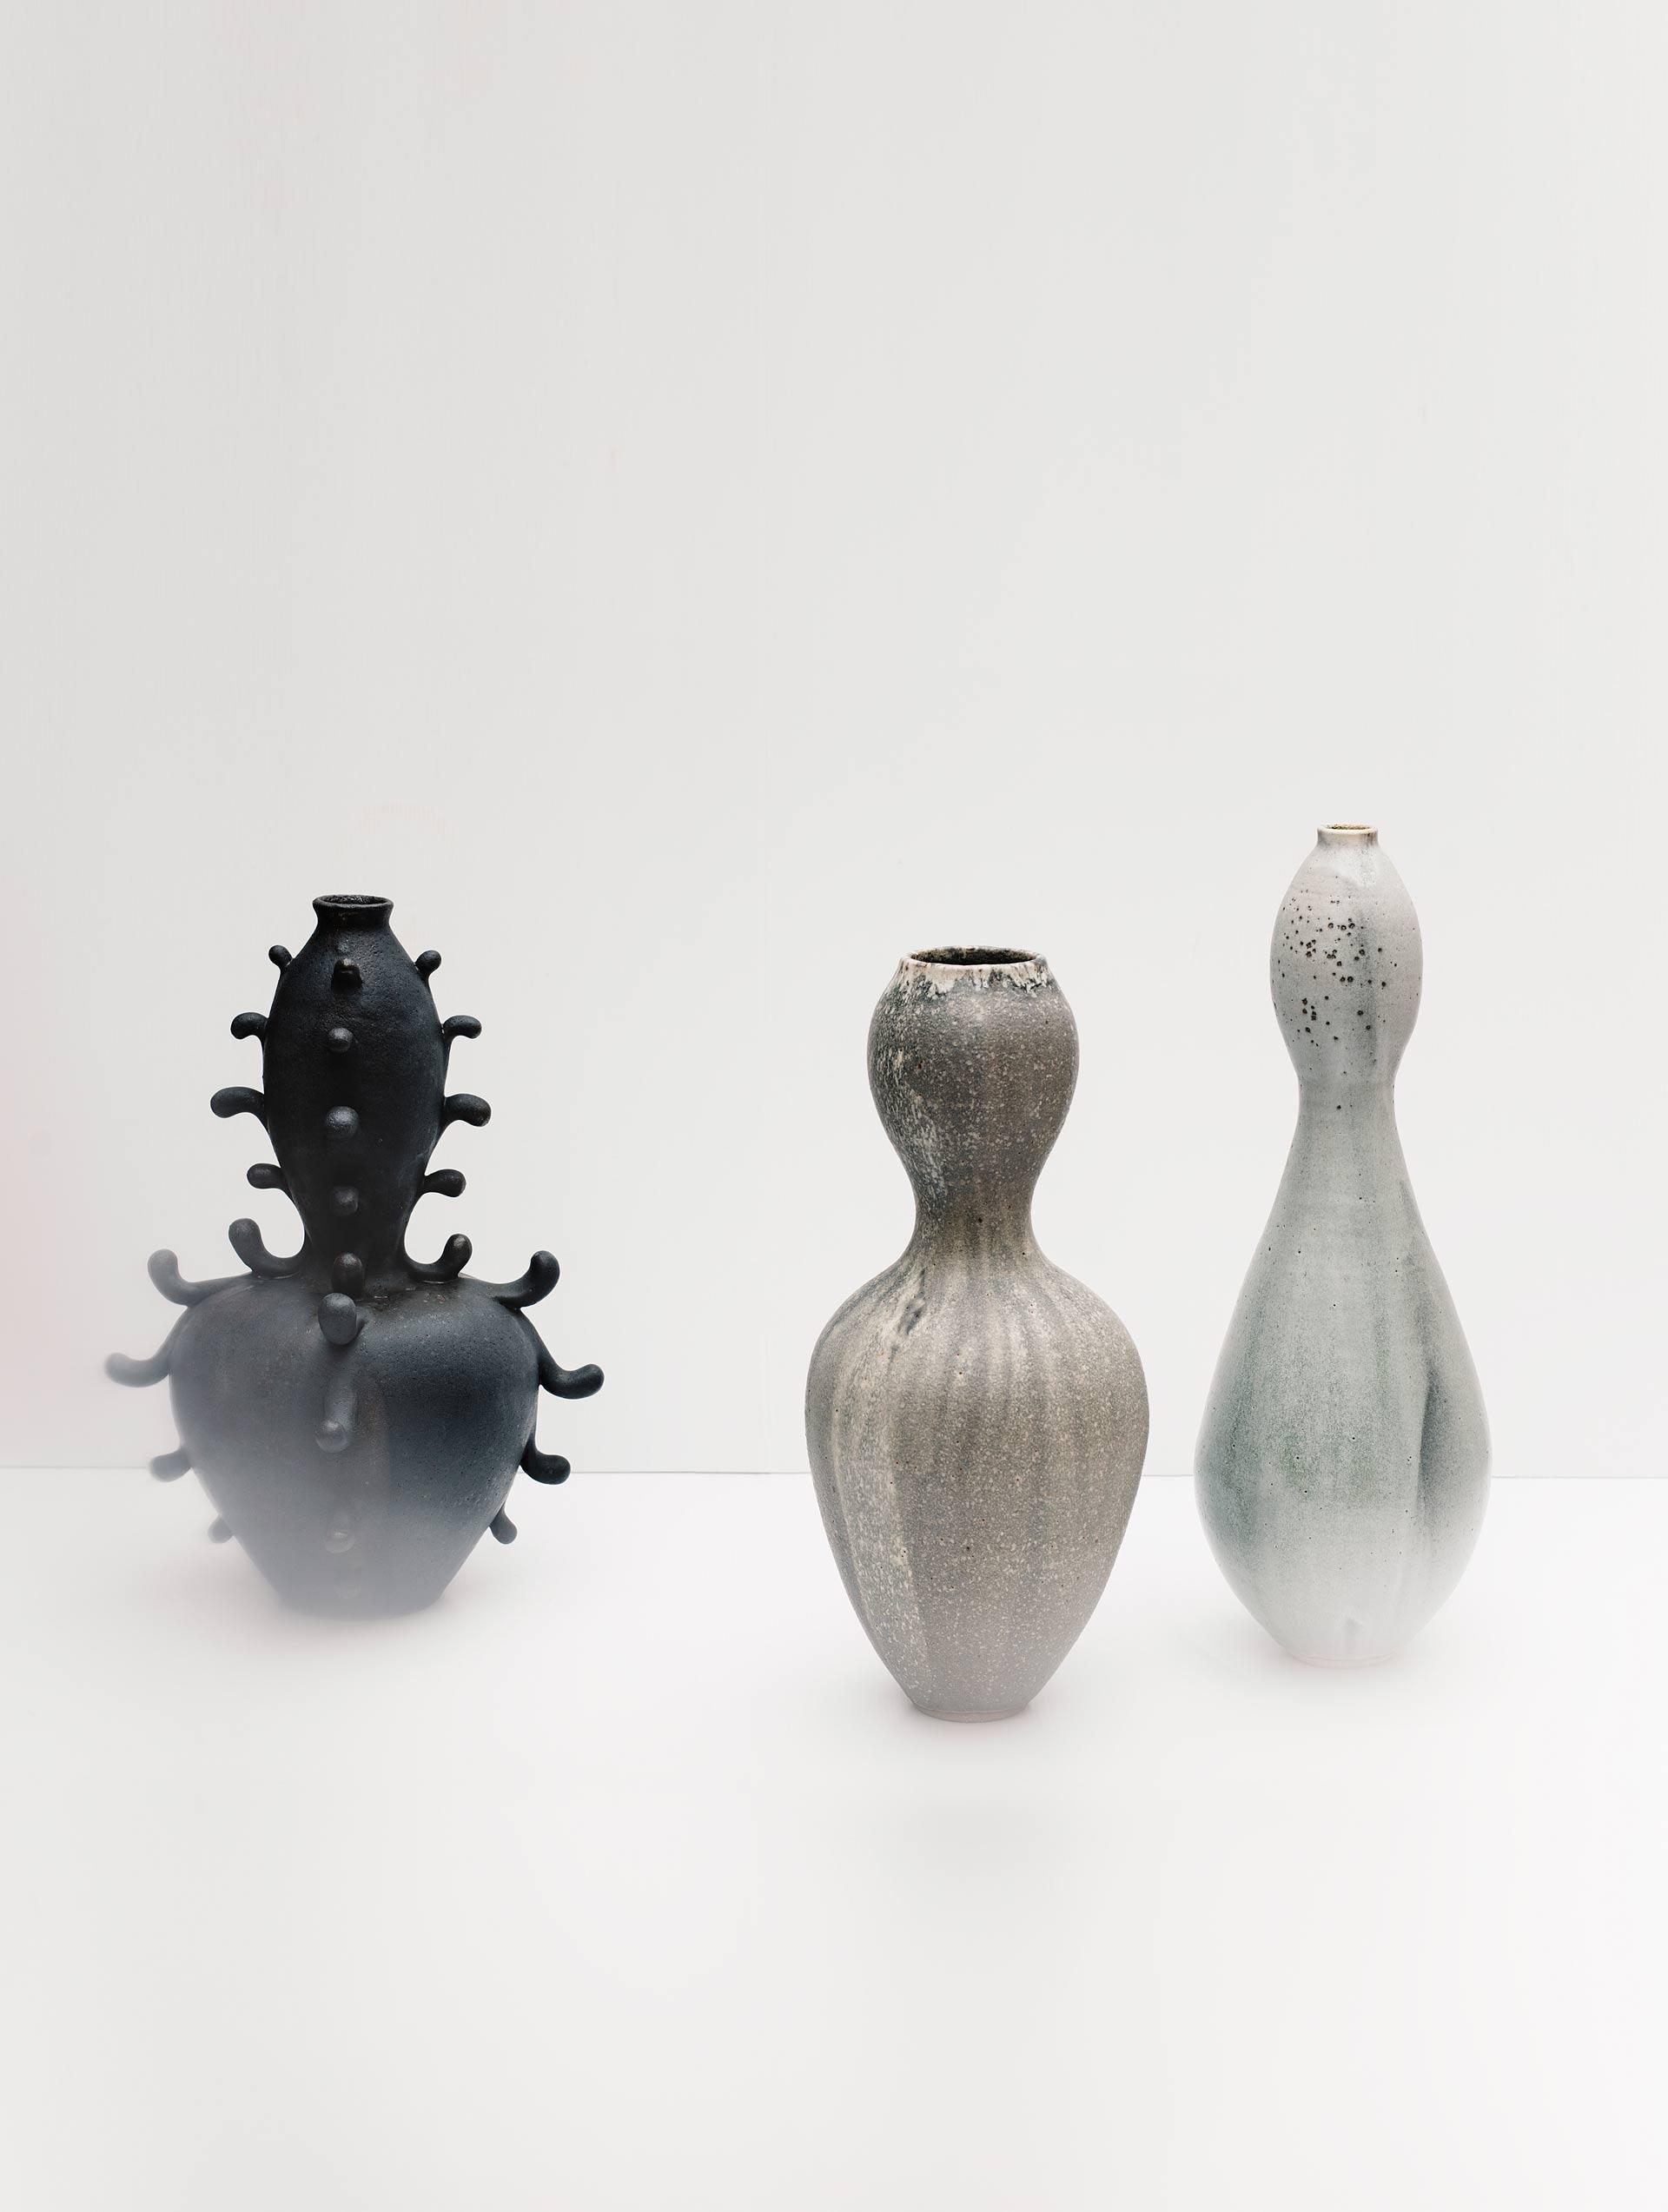 Dynasty Vase, Granite Vessel 2, Cascade Vessel, 2017